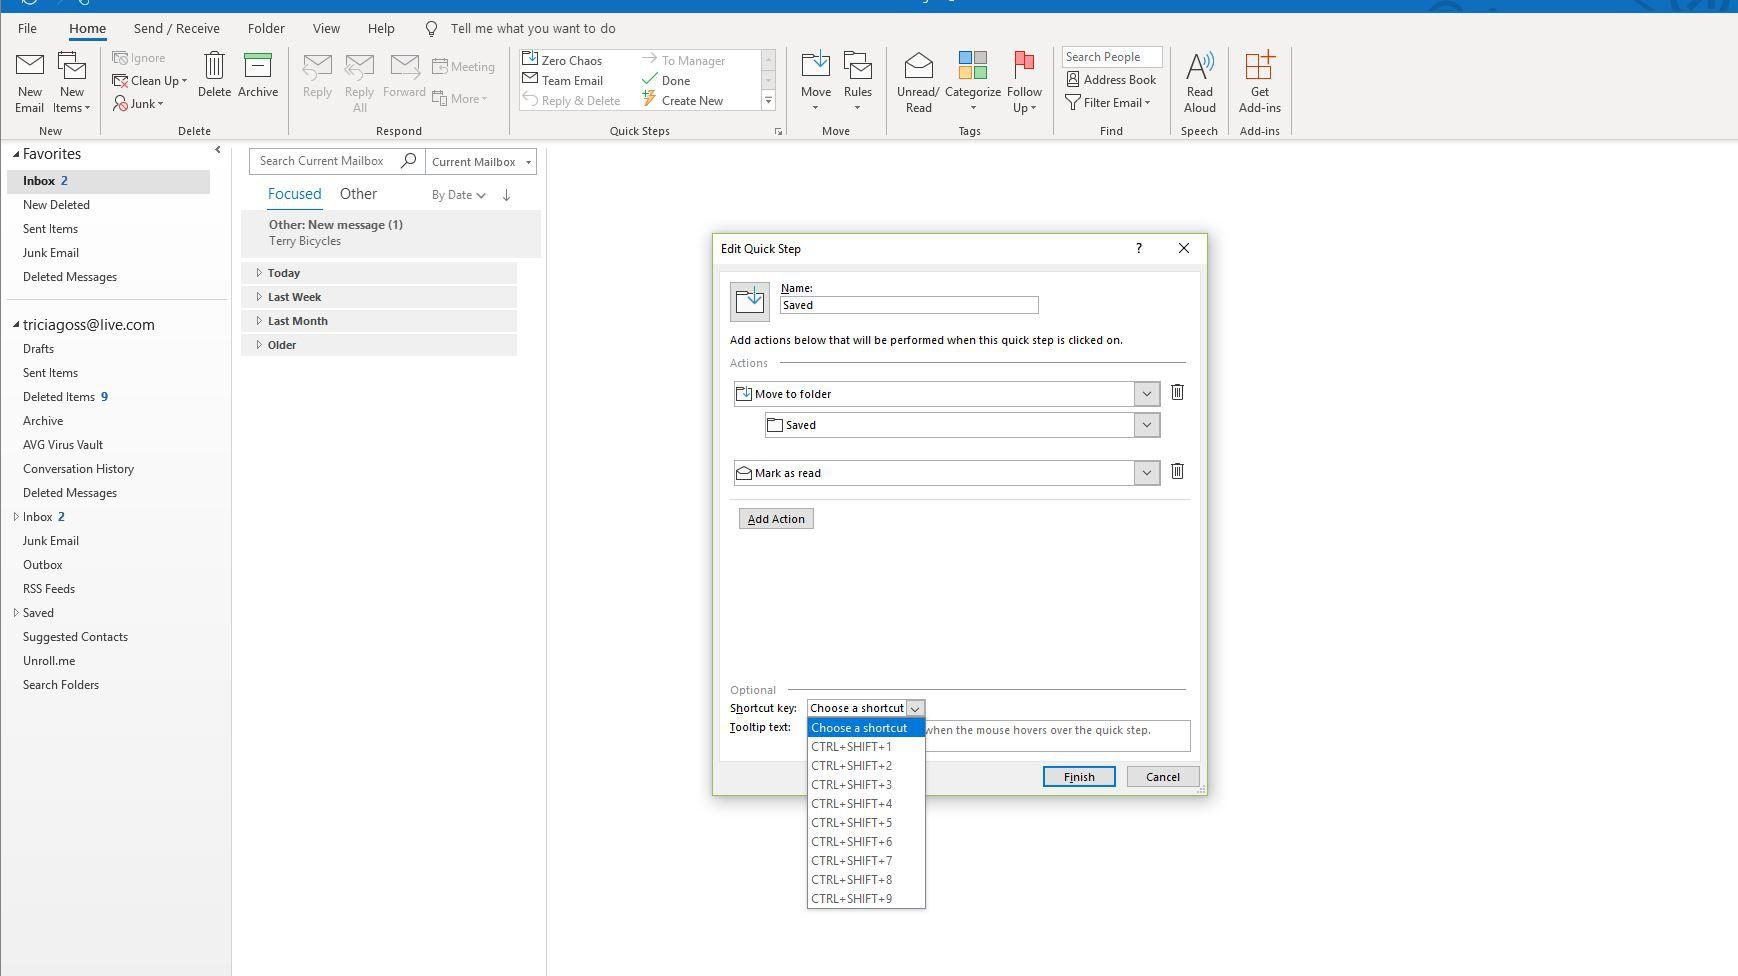 Screenshot of Shortcut Key